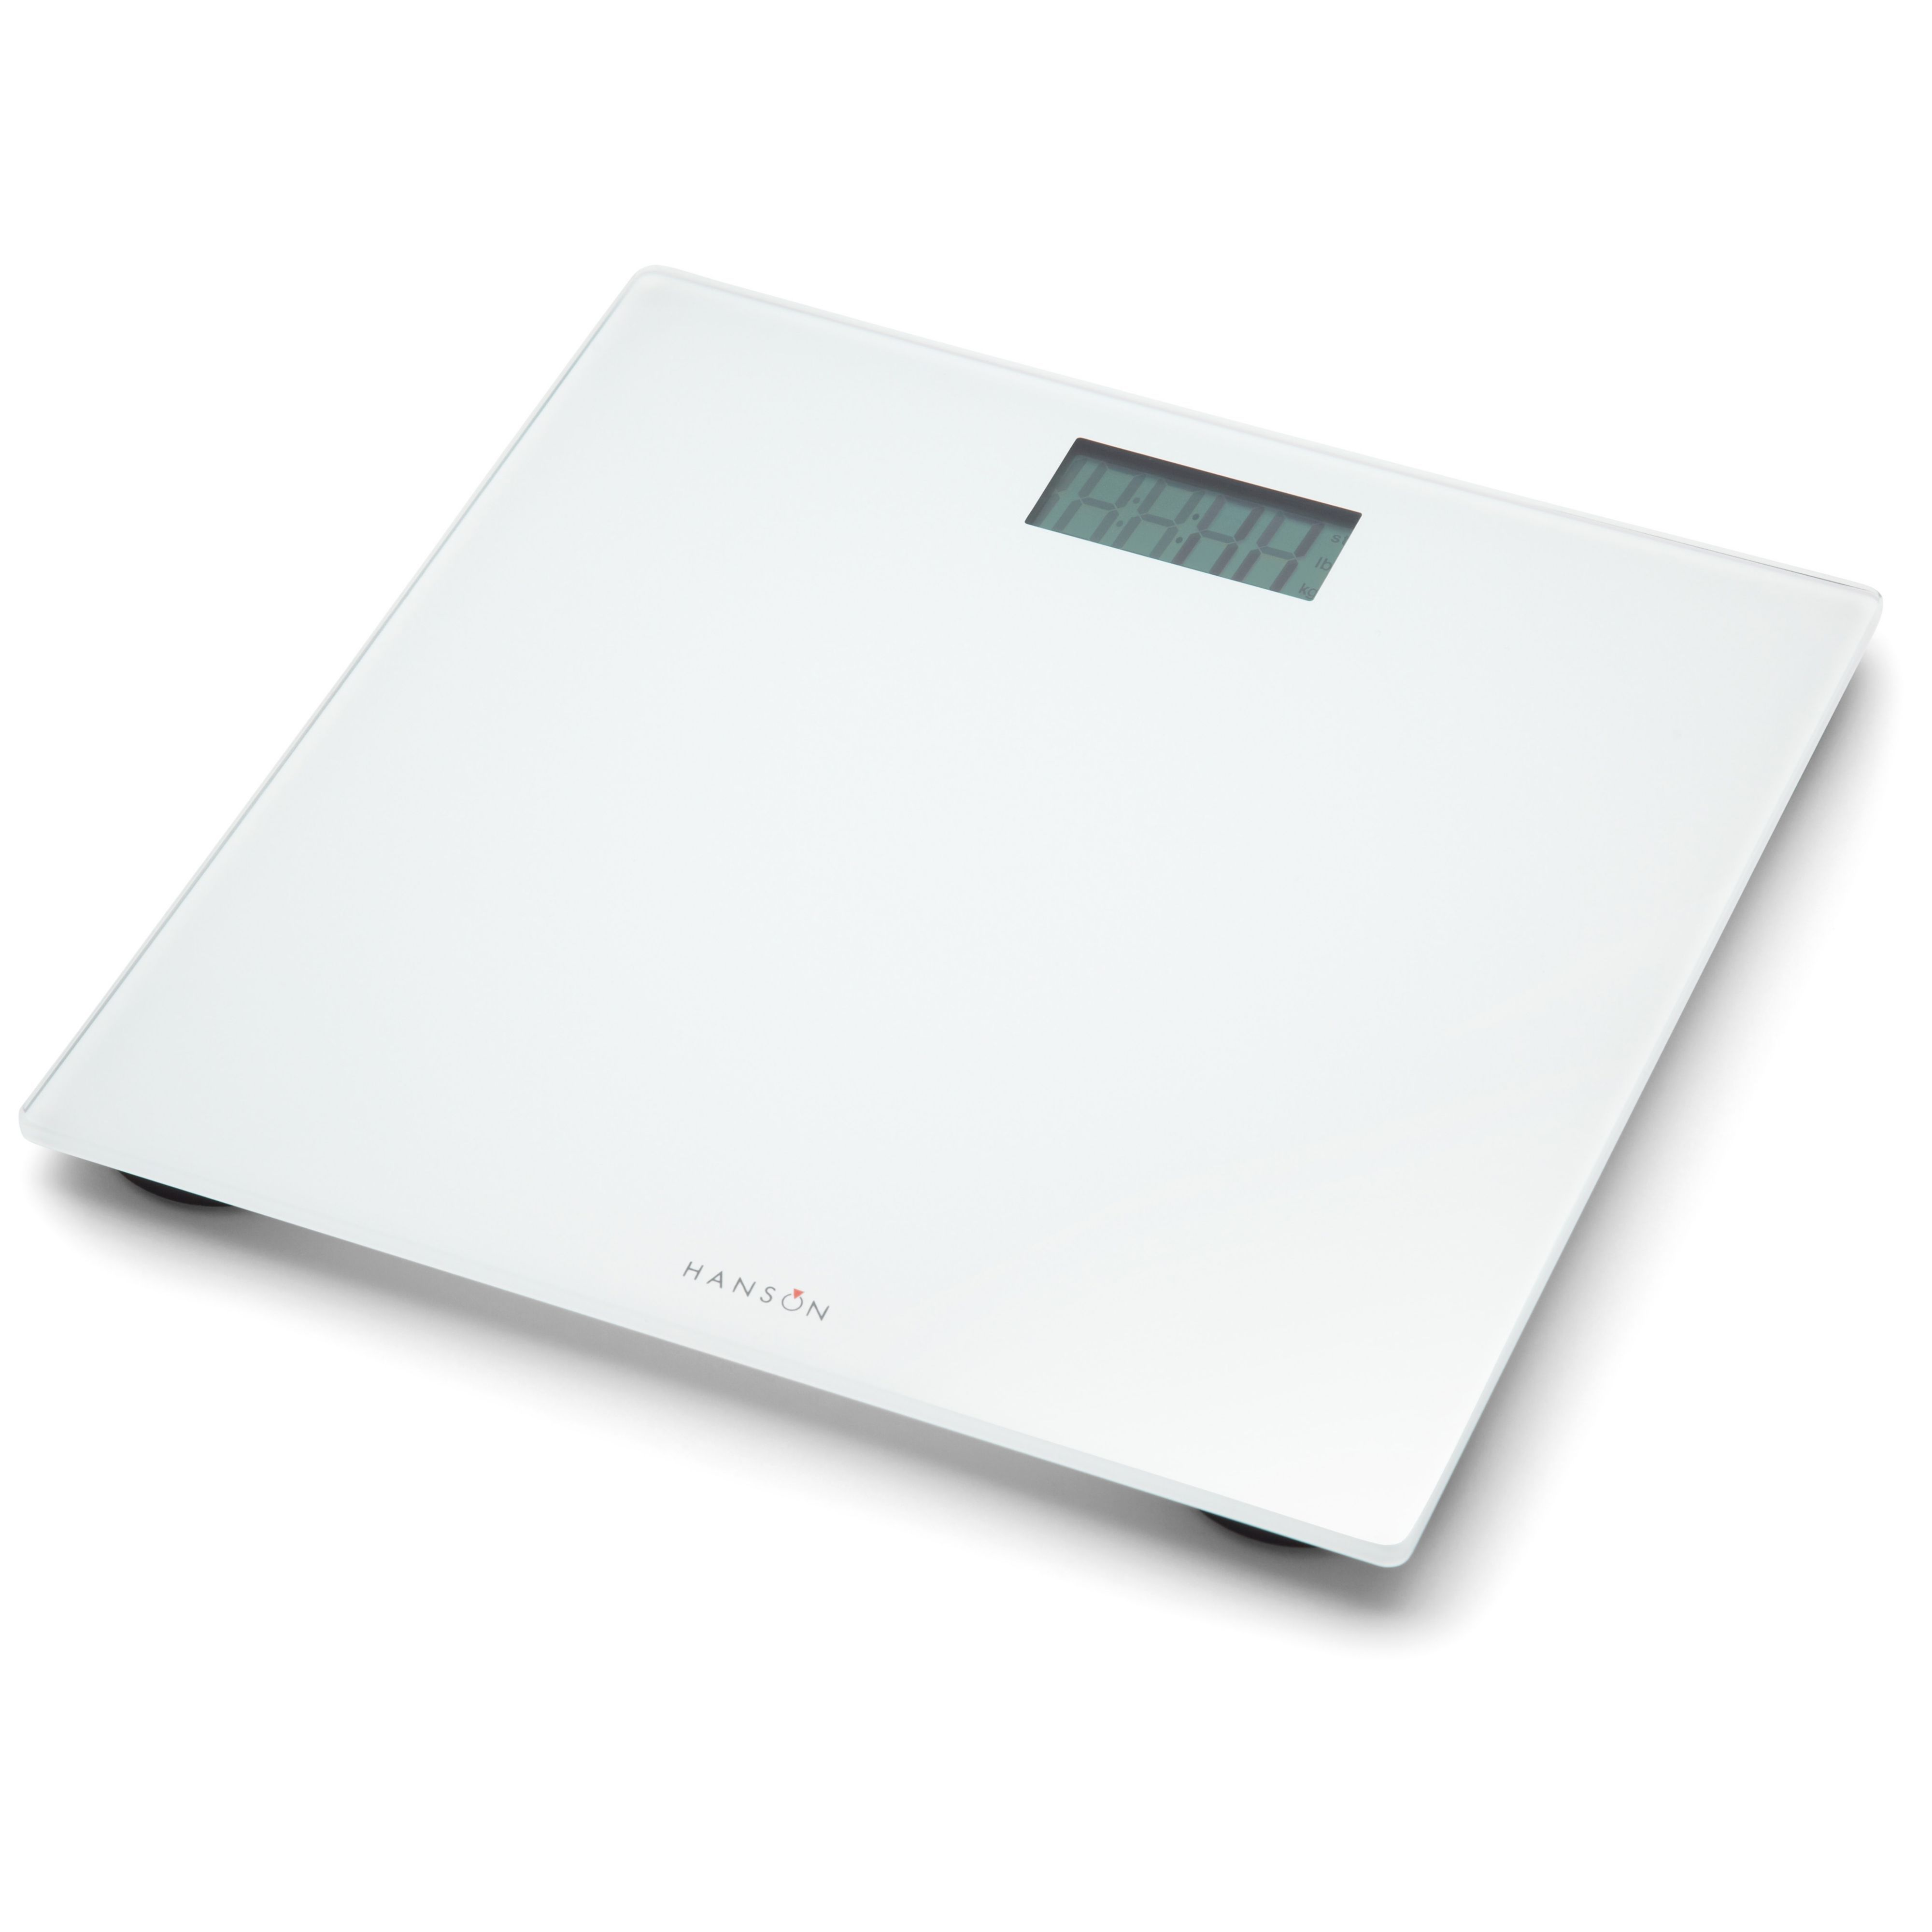 Hanson White Slim Bathroom Scale